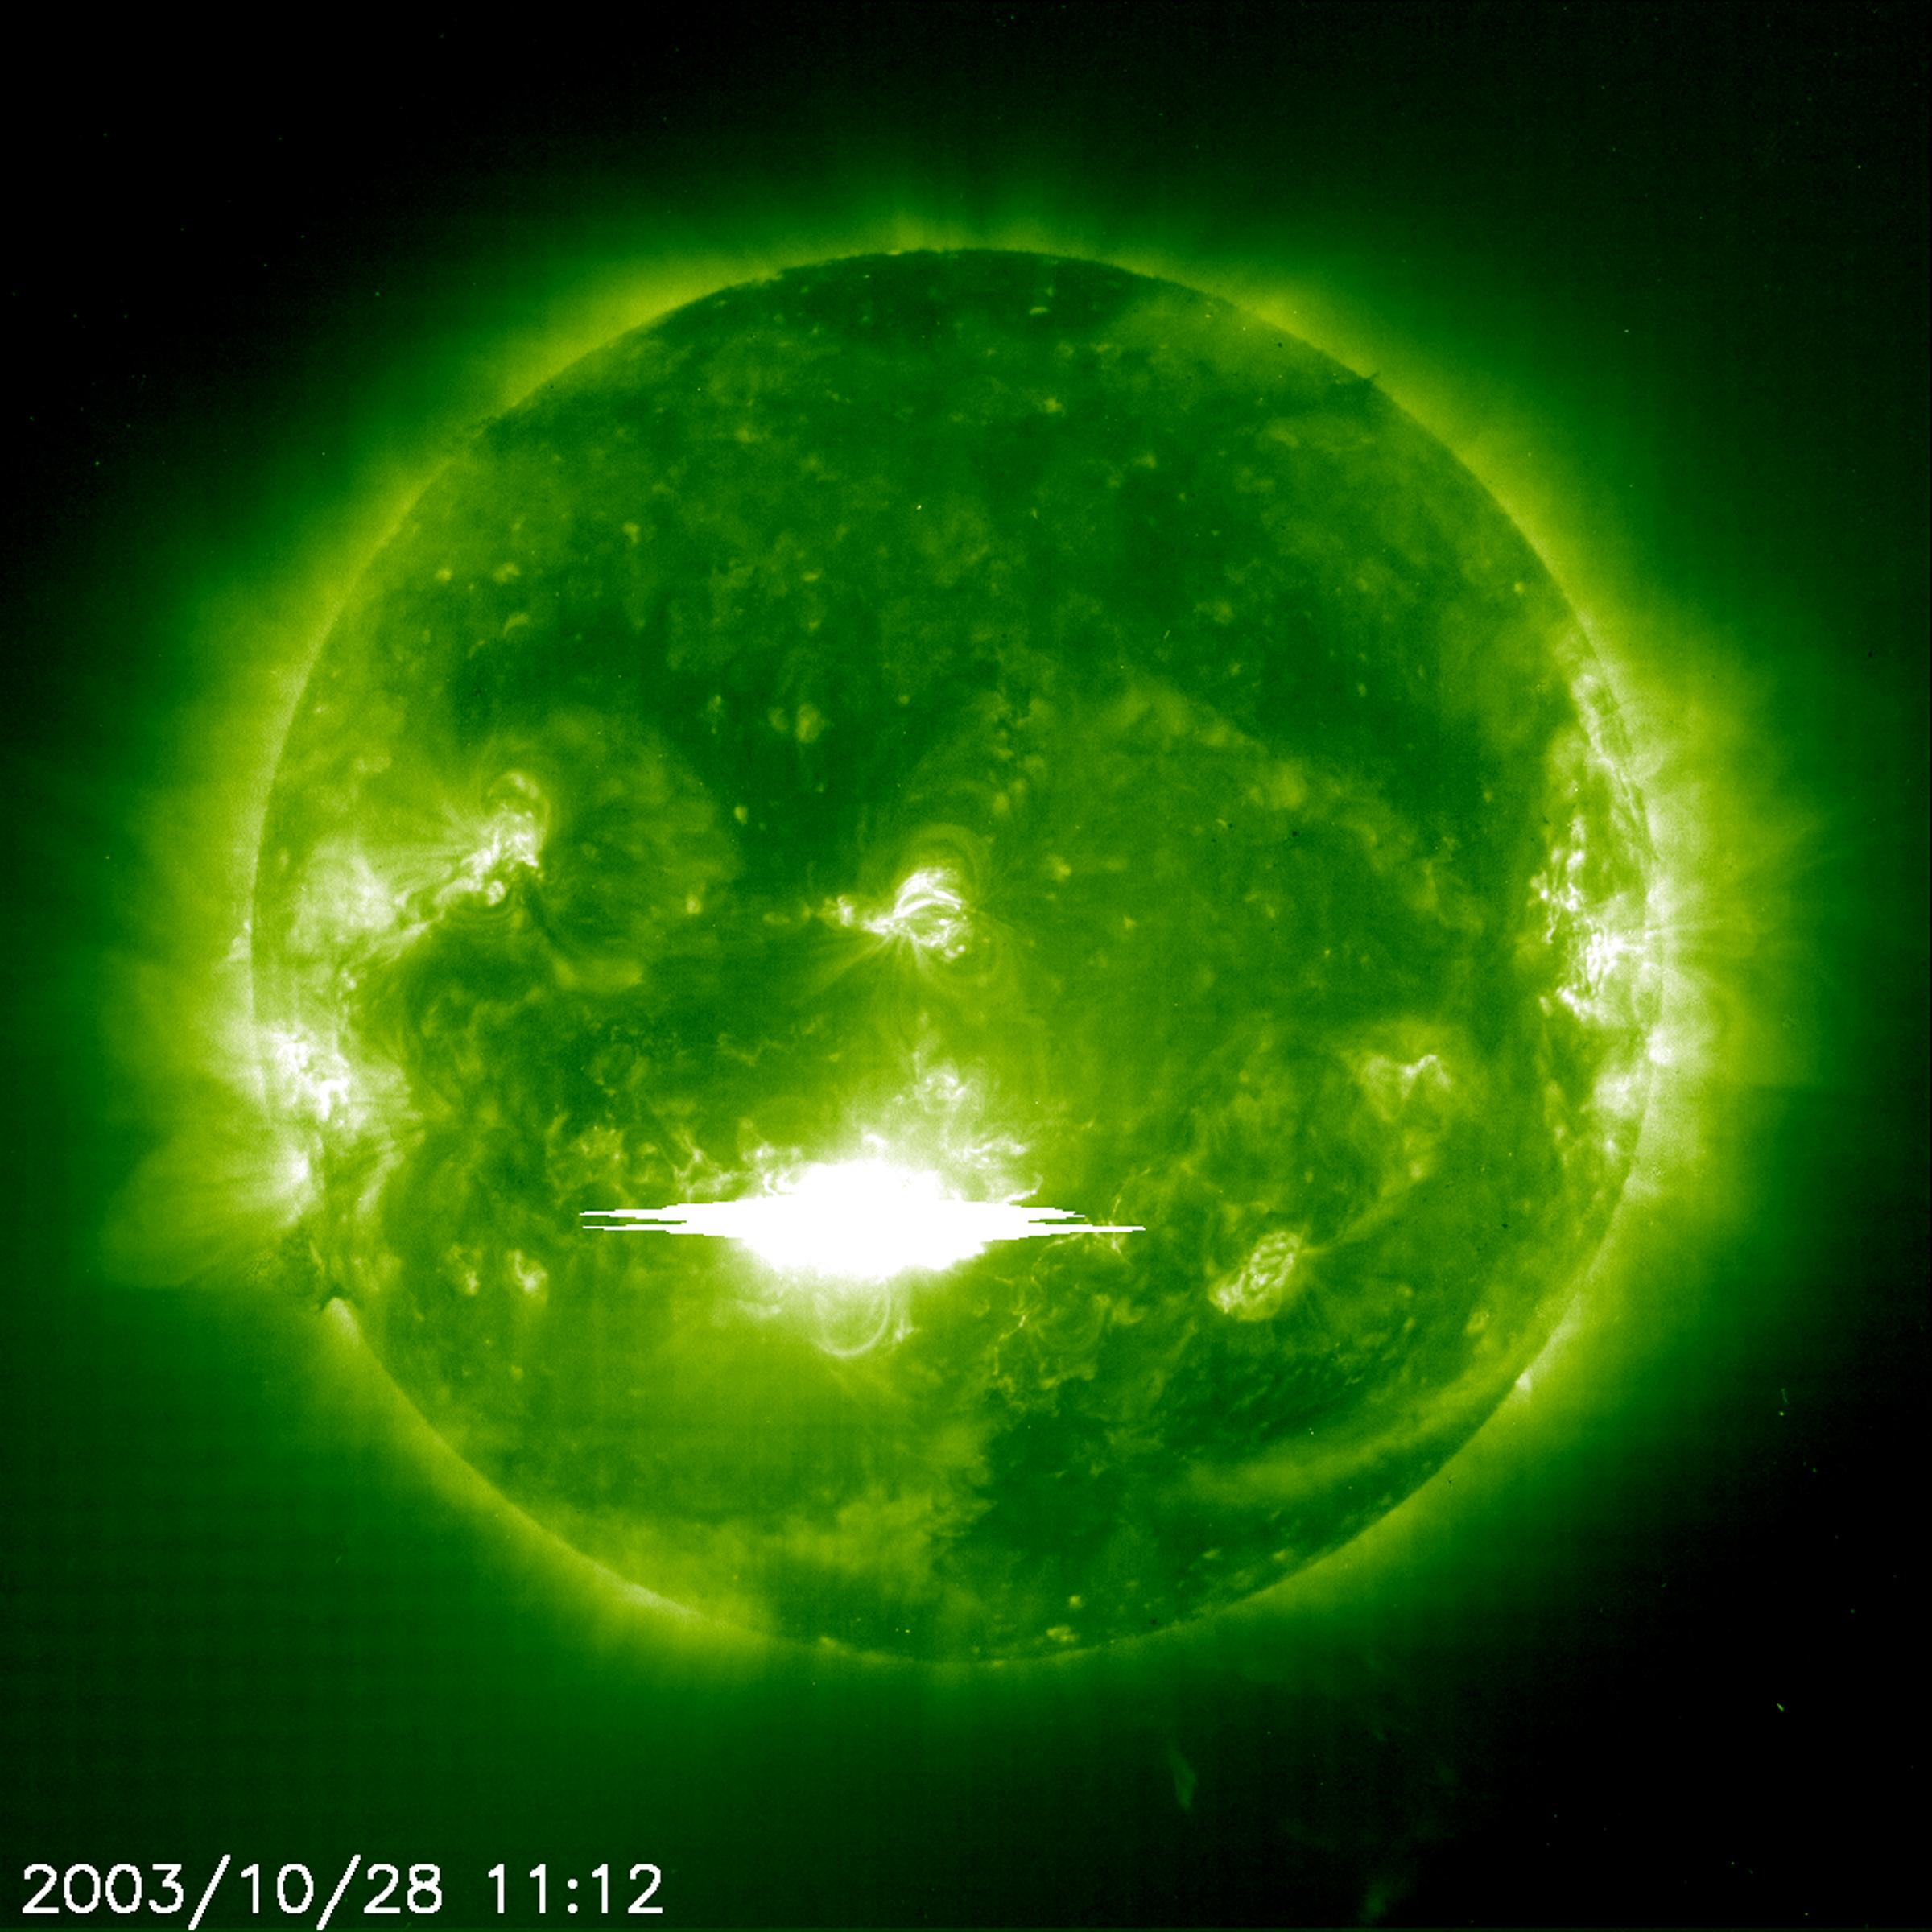 2003: The Ultra-Powerful Halloween Sun Storm